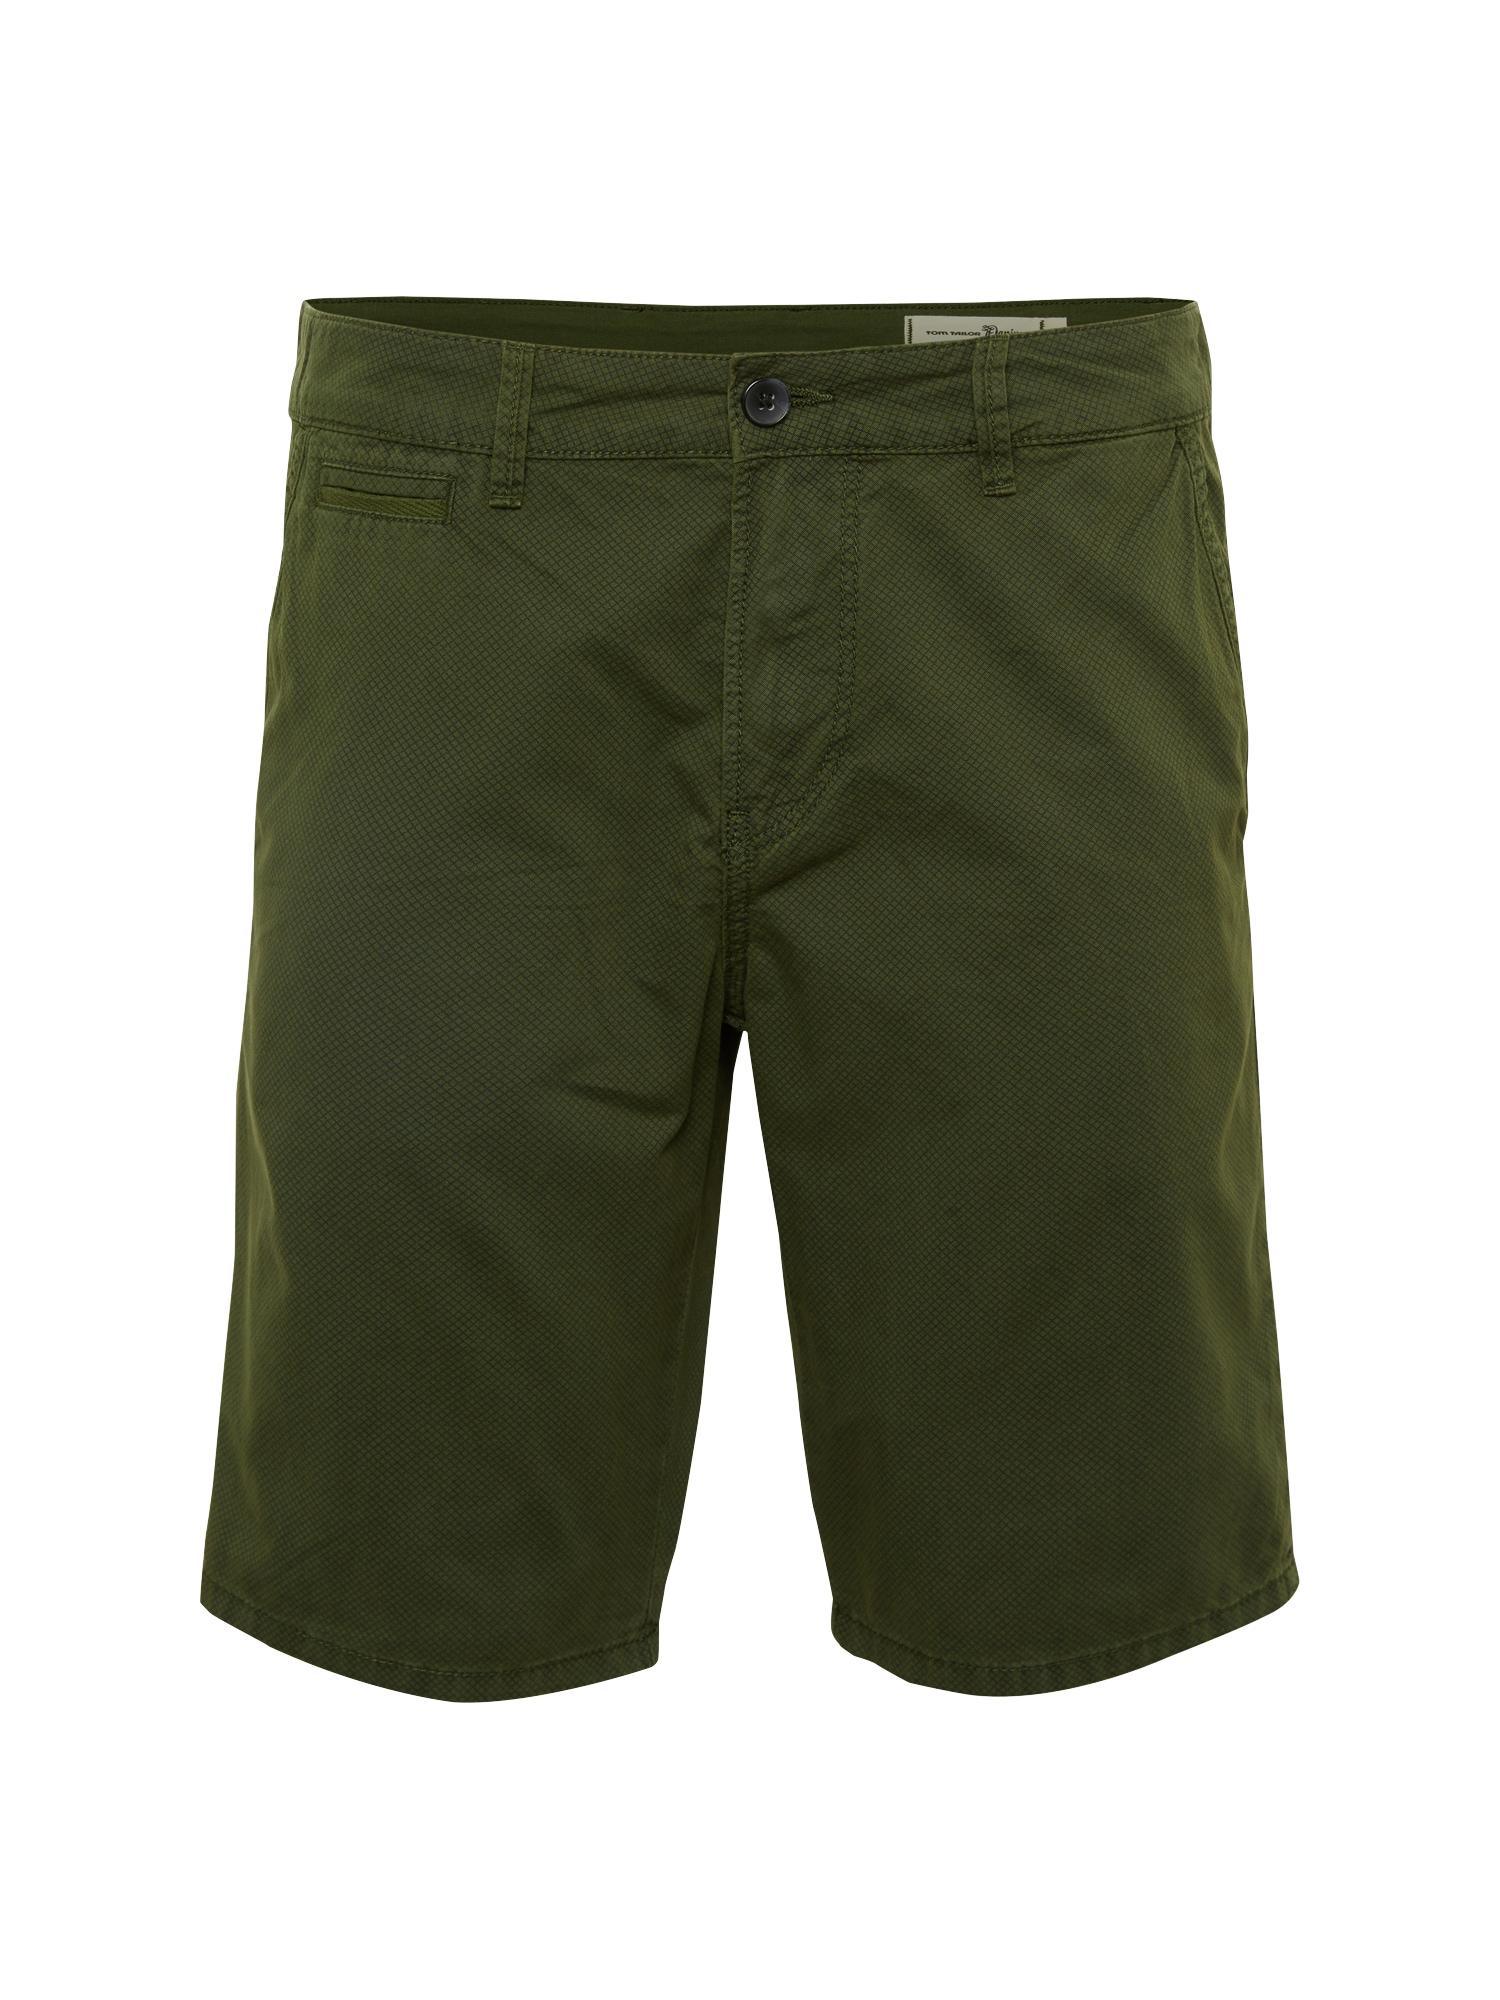 TOM TAILOR DENIM Pantaloni eleganți 'Slim Chino Shorts AOP'  verde iarbă